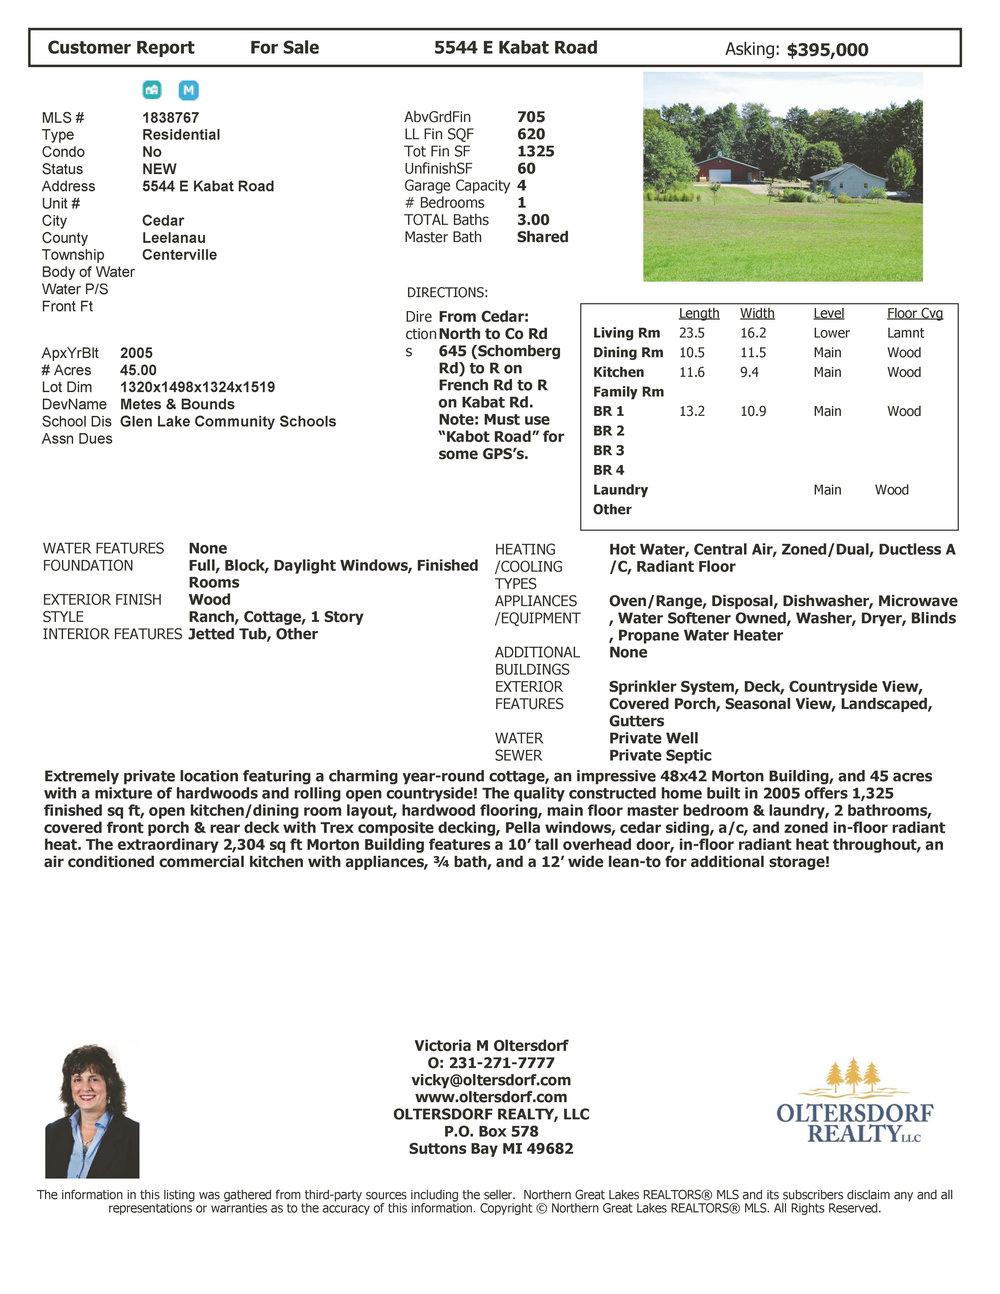 5544 E Kabat Road , Cedar - Marketing Packet for sale by Oltersdorf Realty LLC (8).jpg